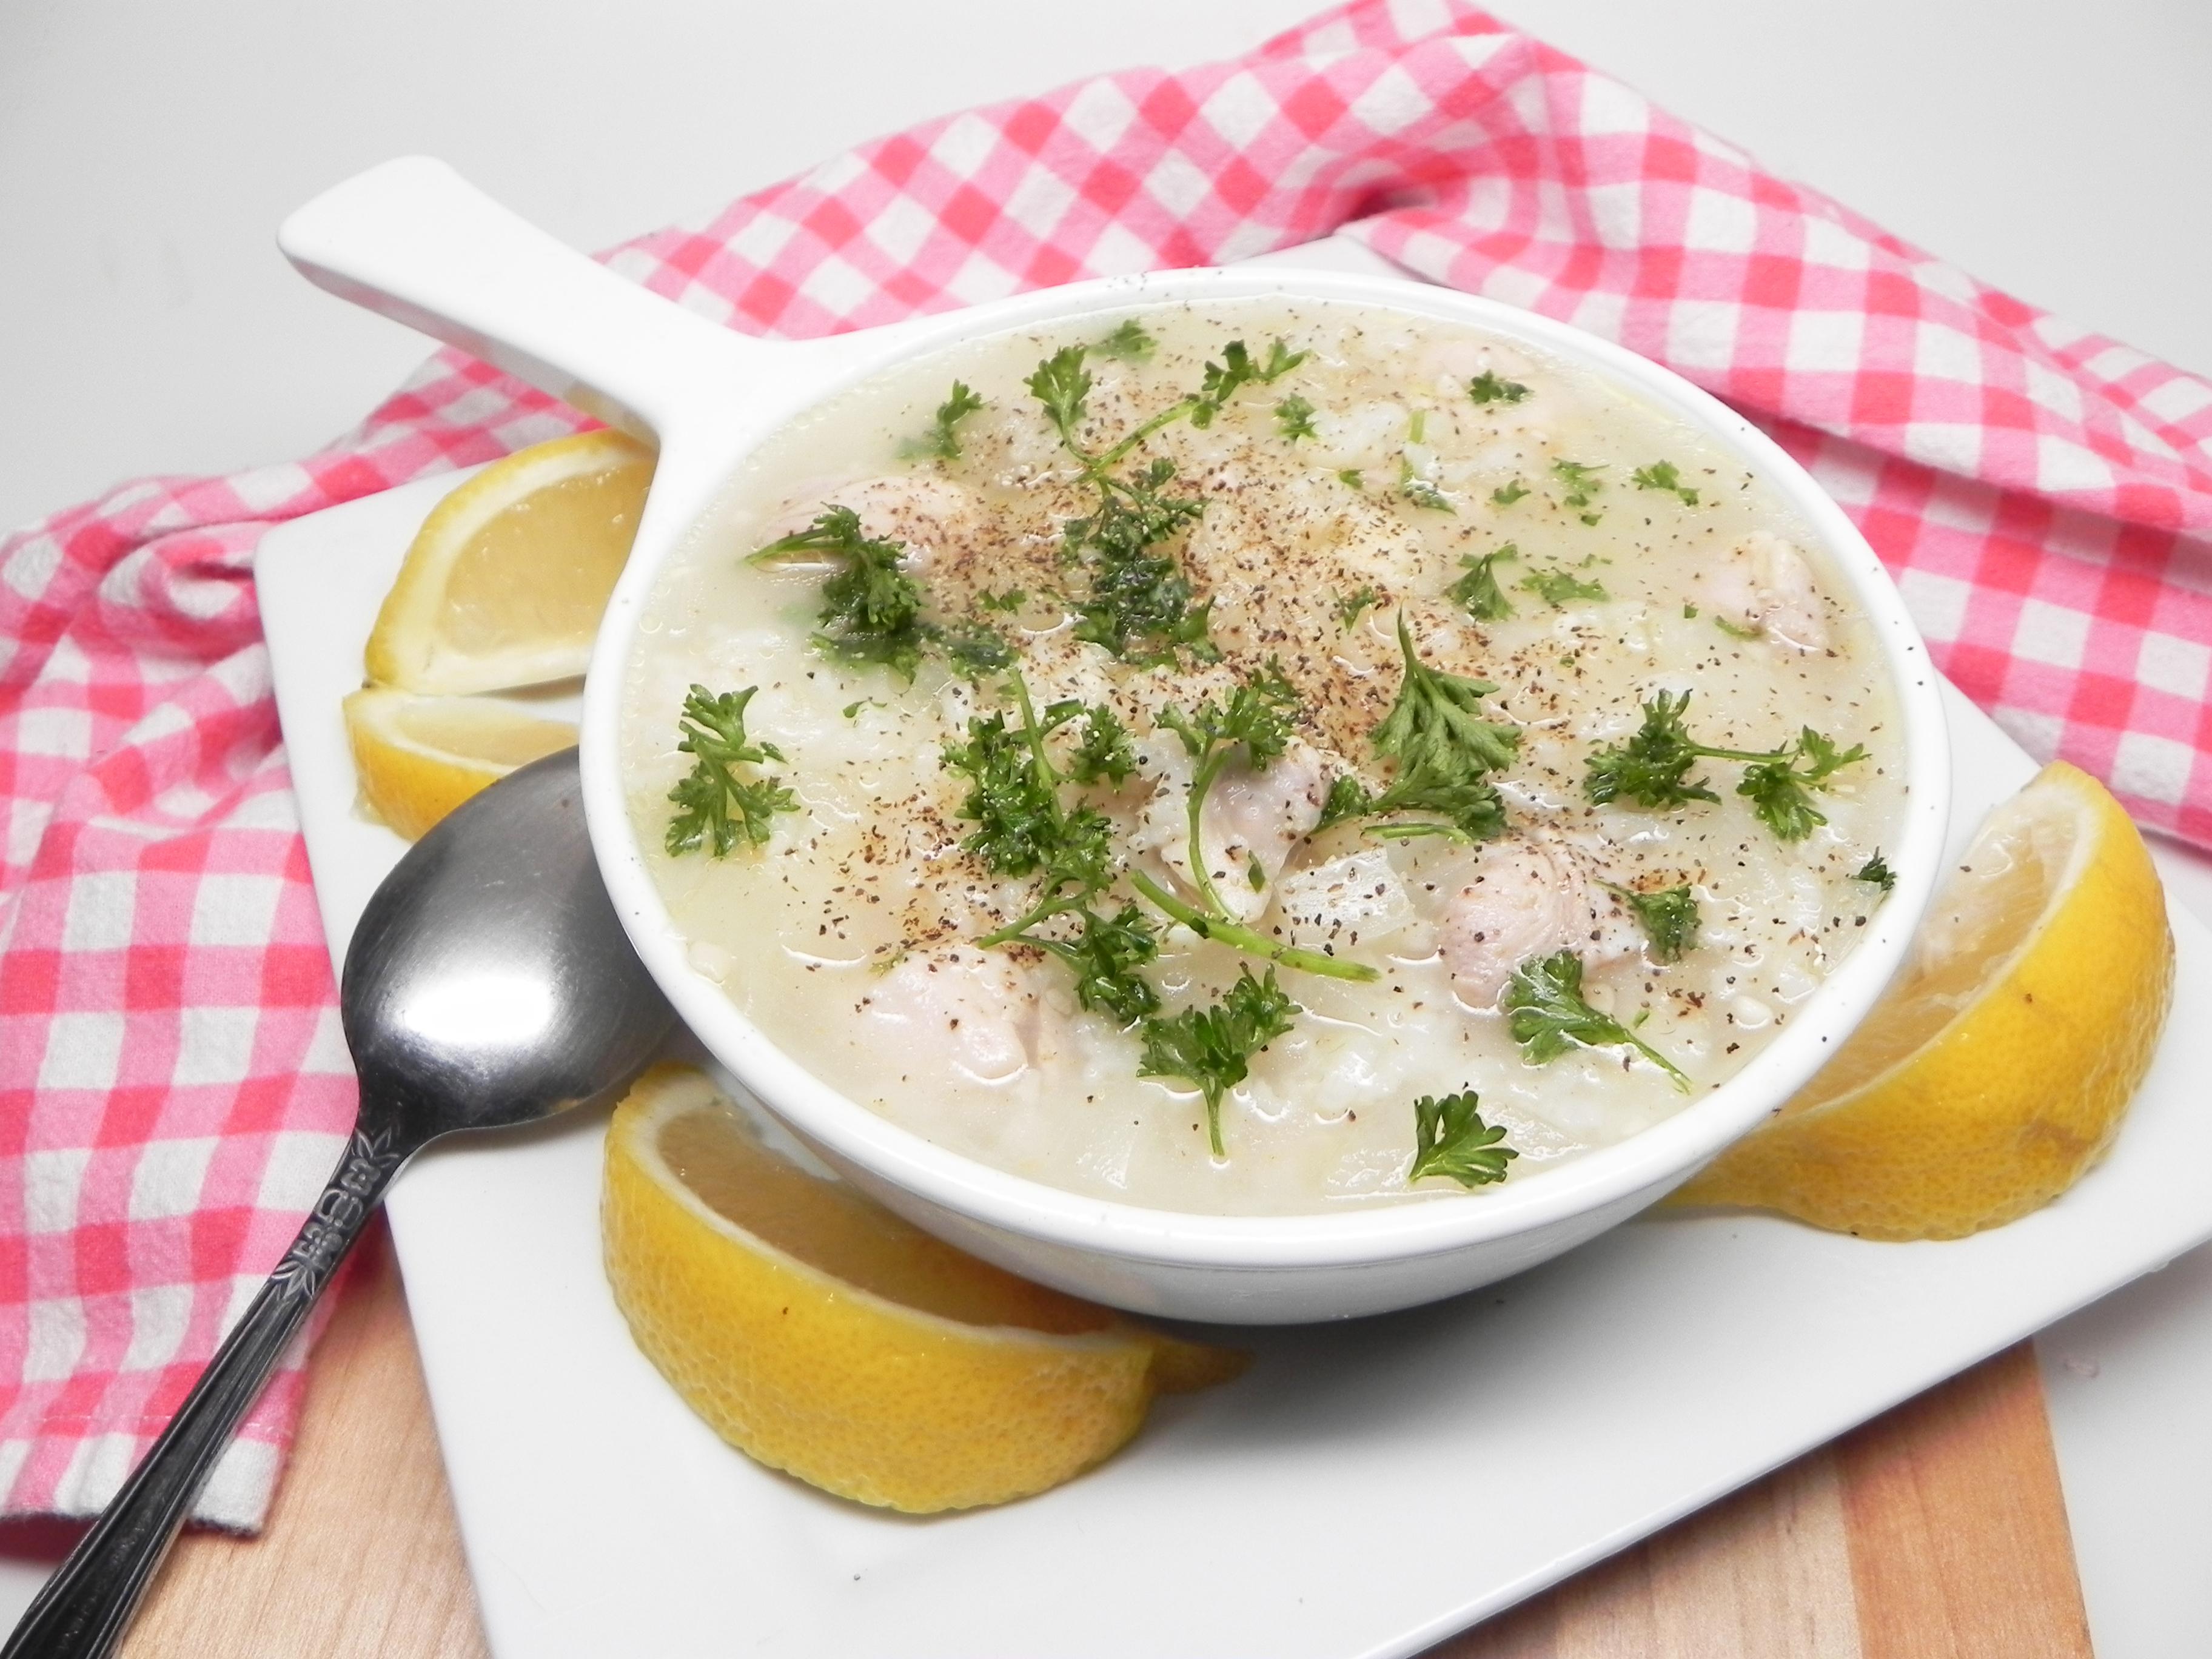 Arroz Caldo (Filipino Chicken and Rice Soup)